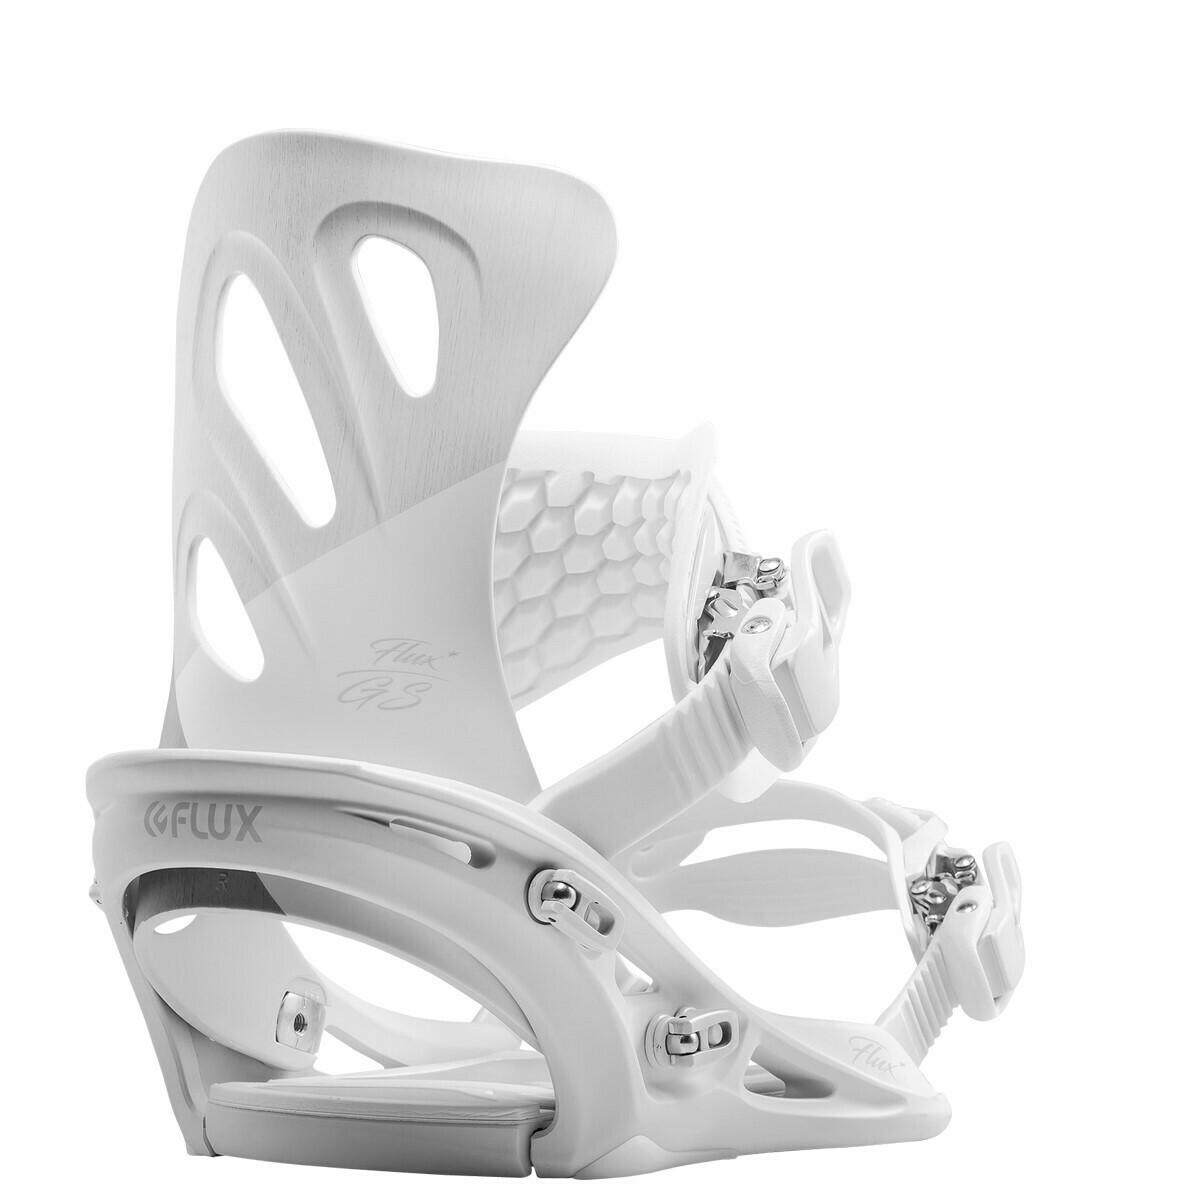 GS White - FLUX Bindung